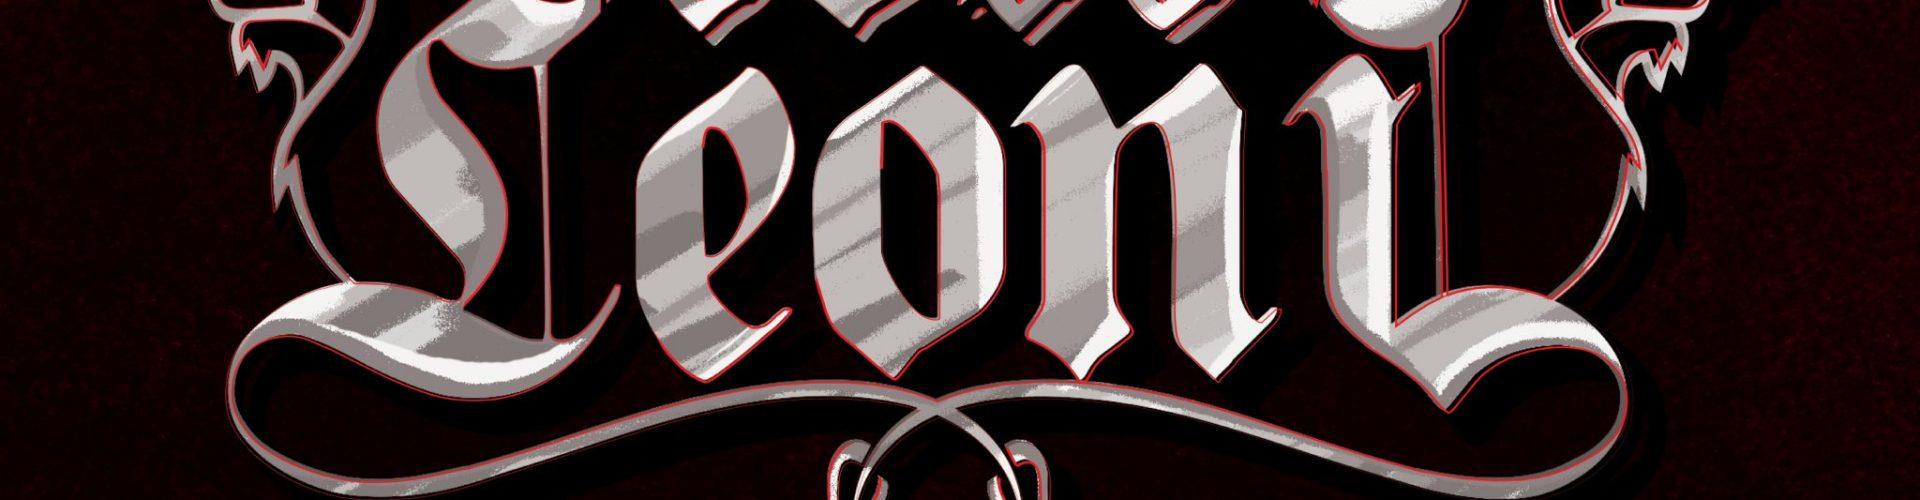 Metal-Review: CORELEONI – II